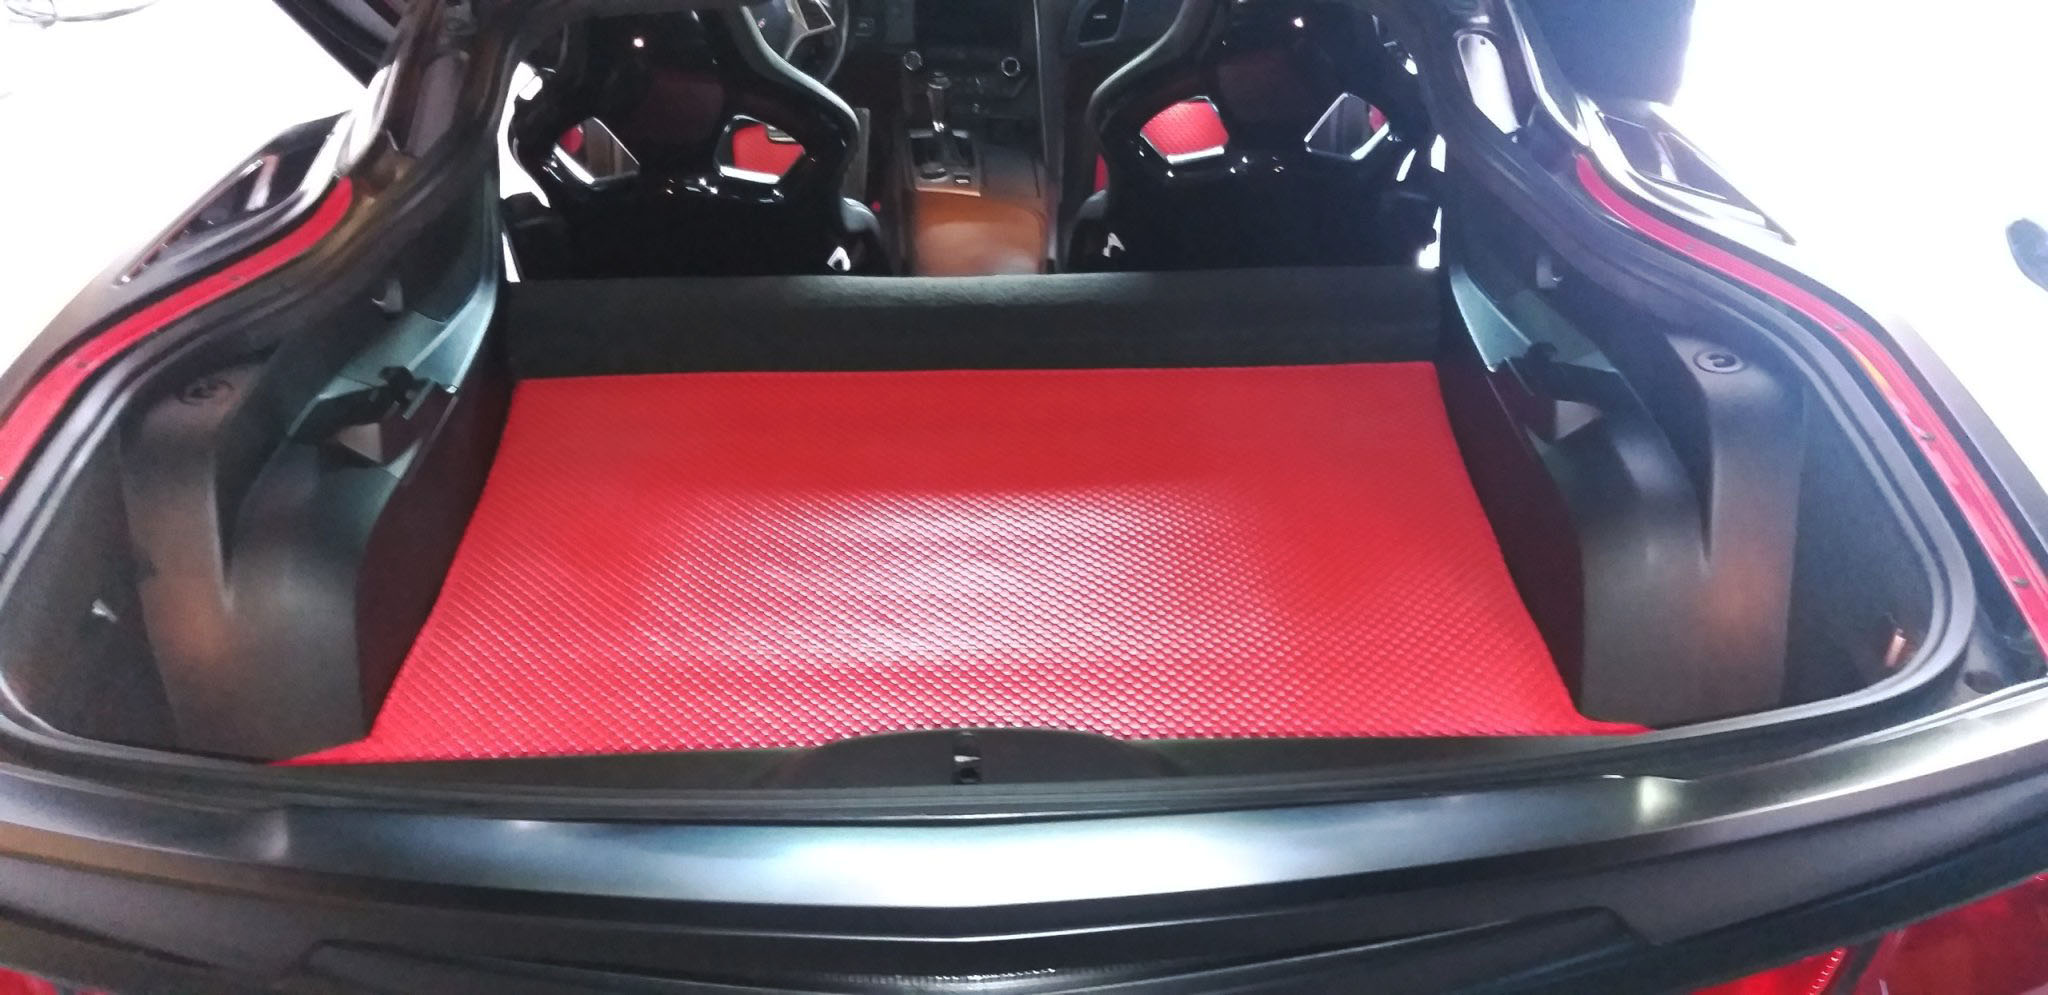 Thảm lót cốp Chevrolet Corvette C7